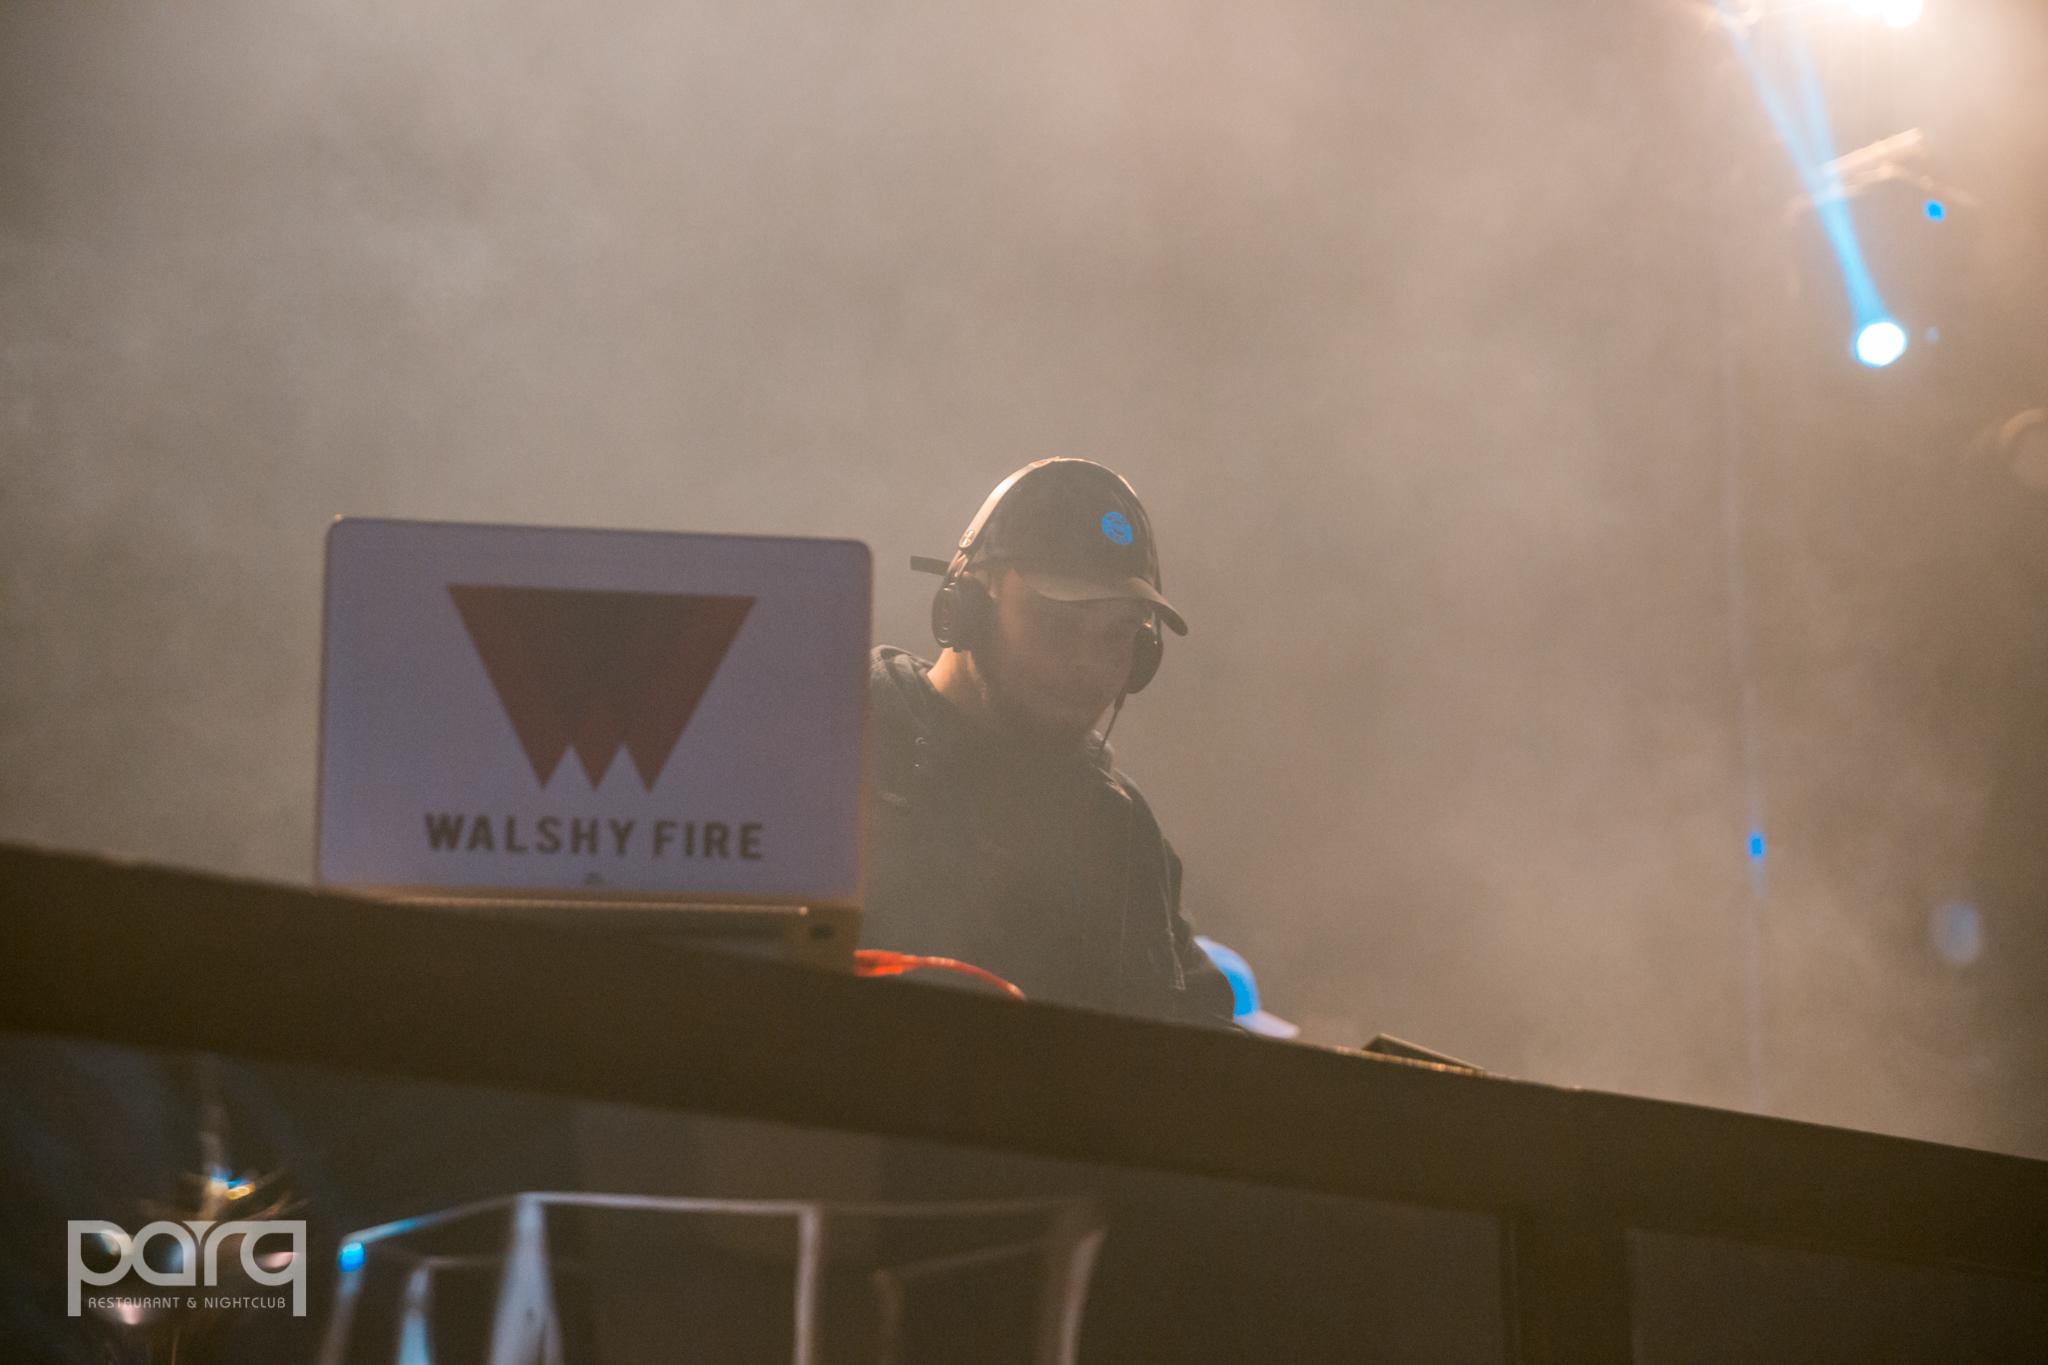 04.13.18 Parq - Walshy Fire-14.jpg